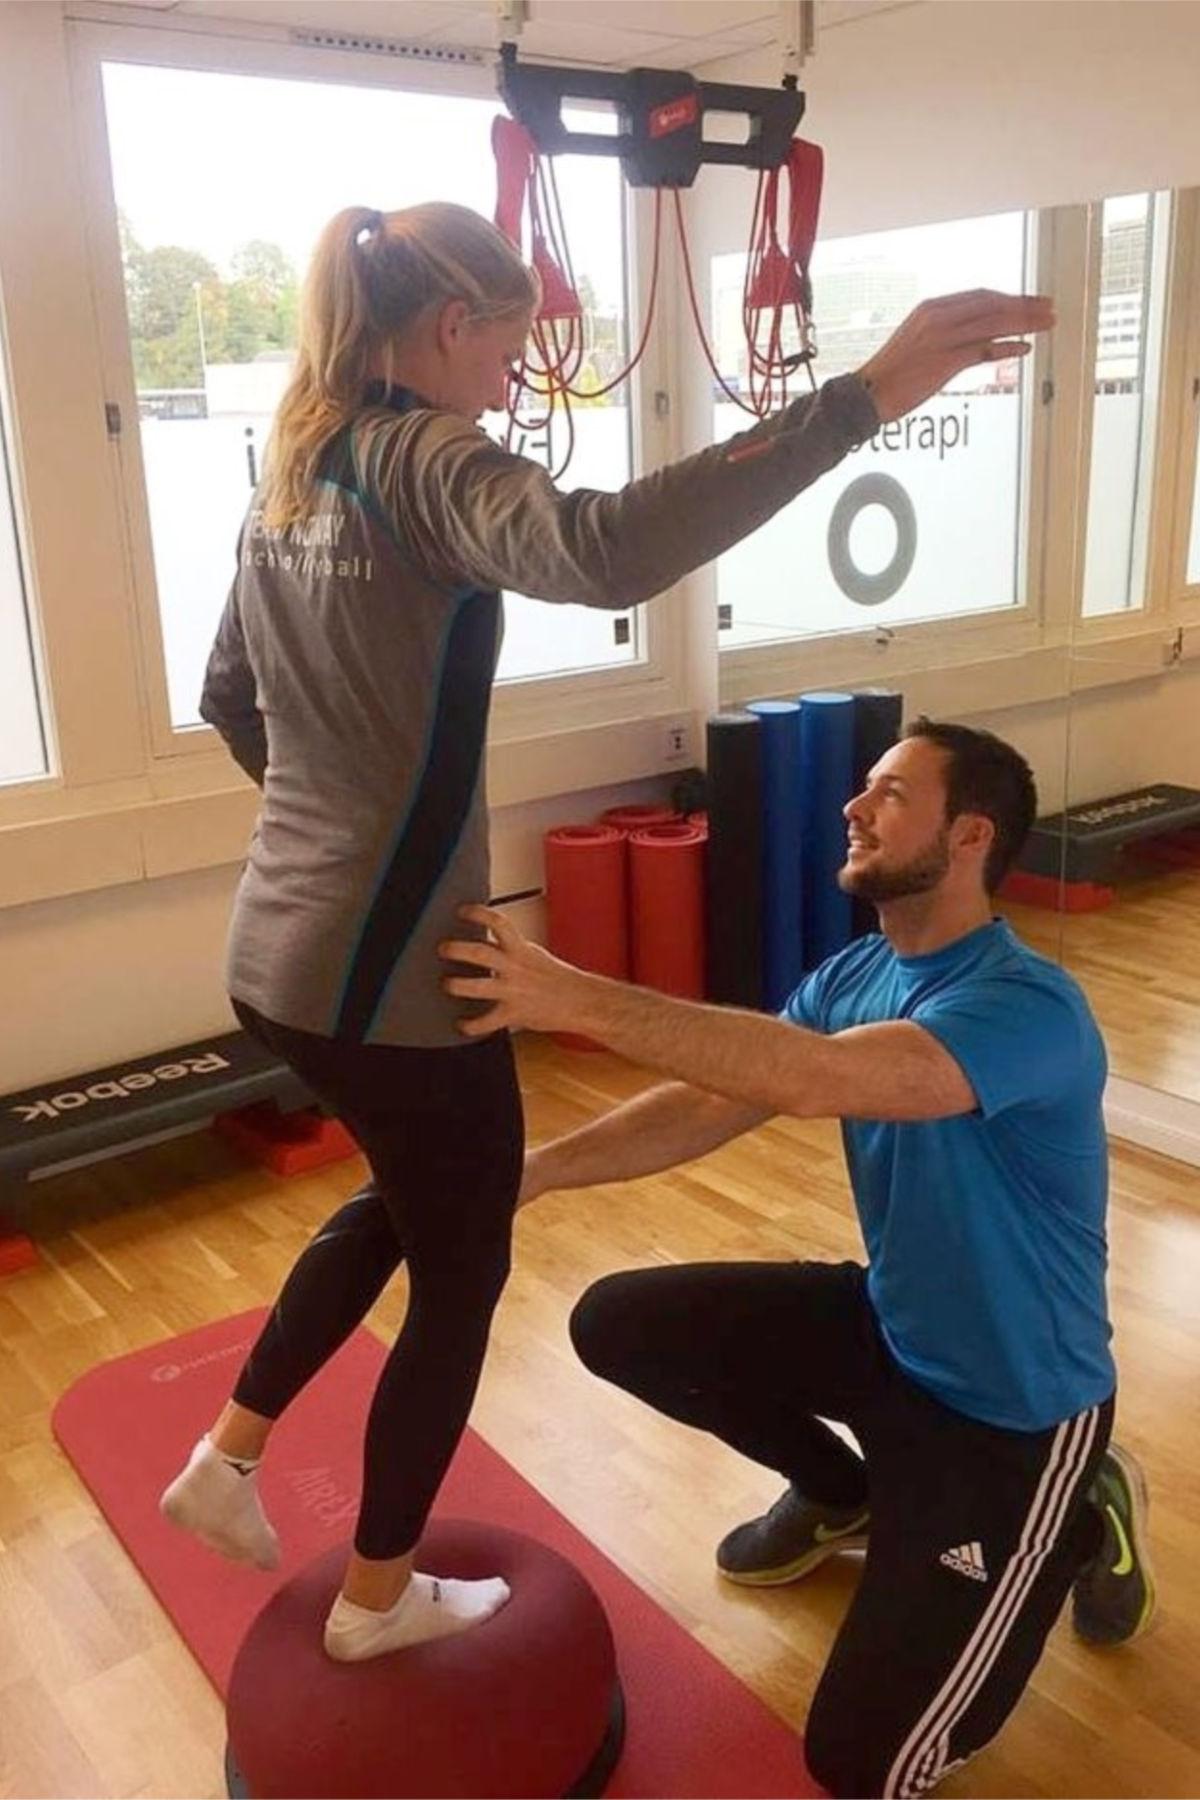 Ingrid får nøye instrukser fra fysioterapeut Troels Skole Hansen. FOTO: Fokusklinikken